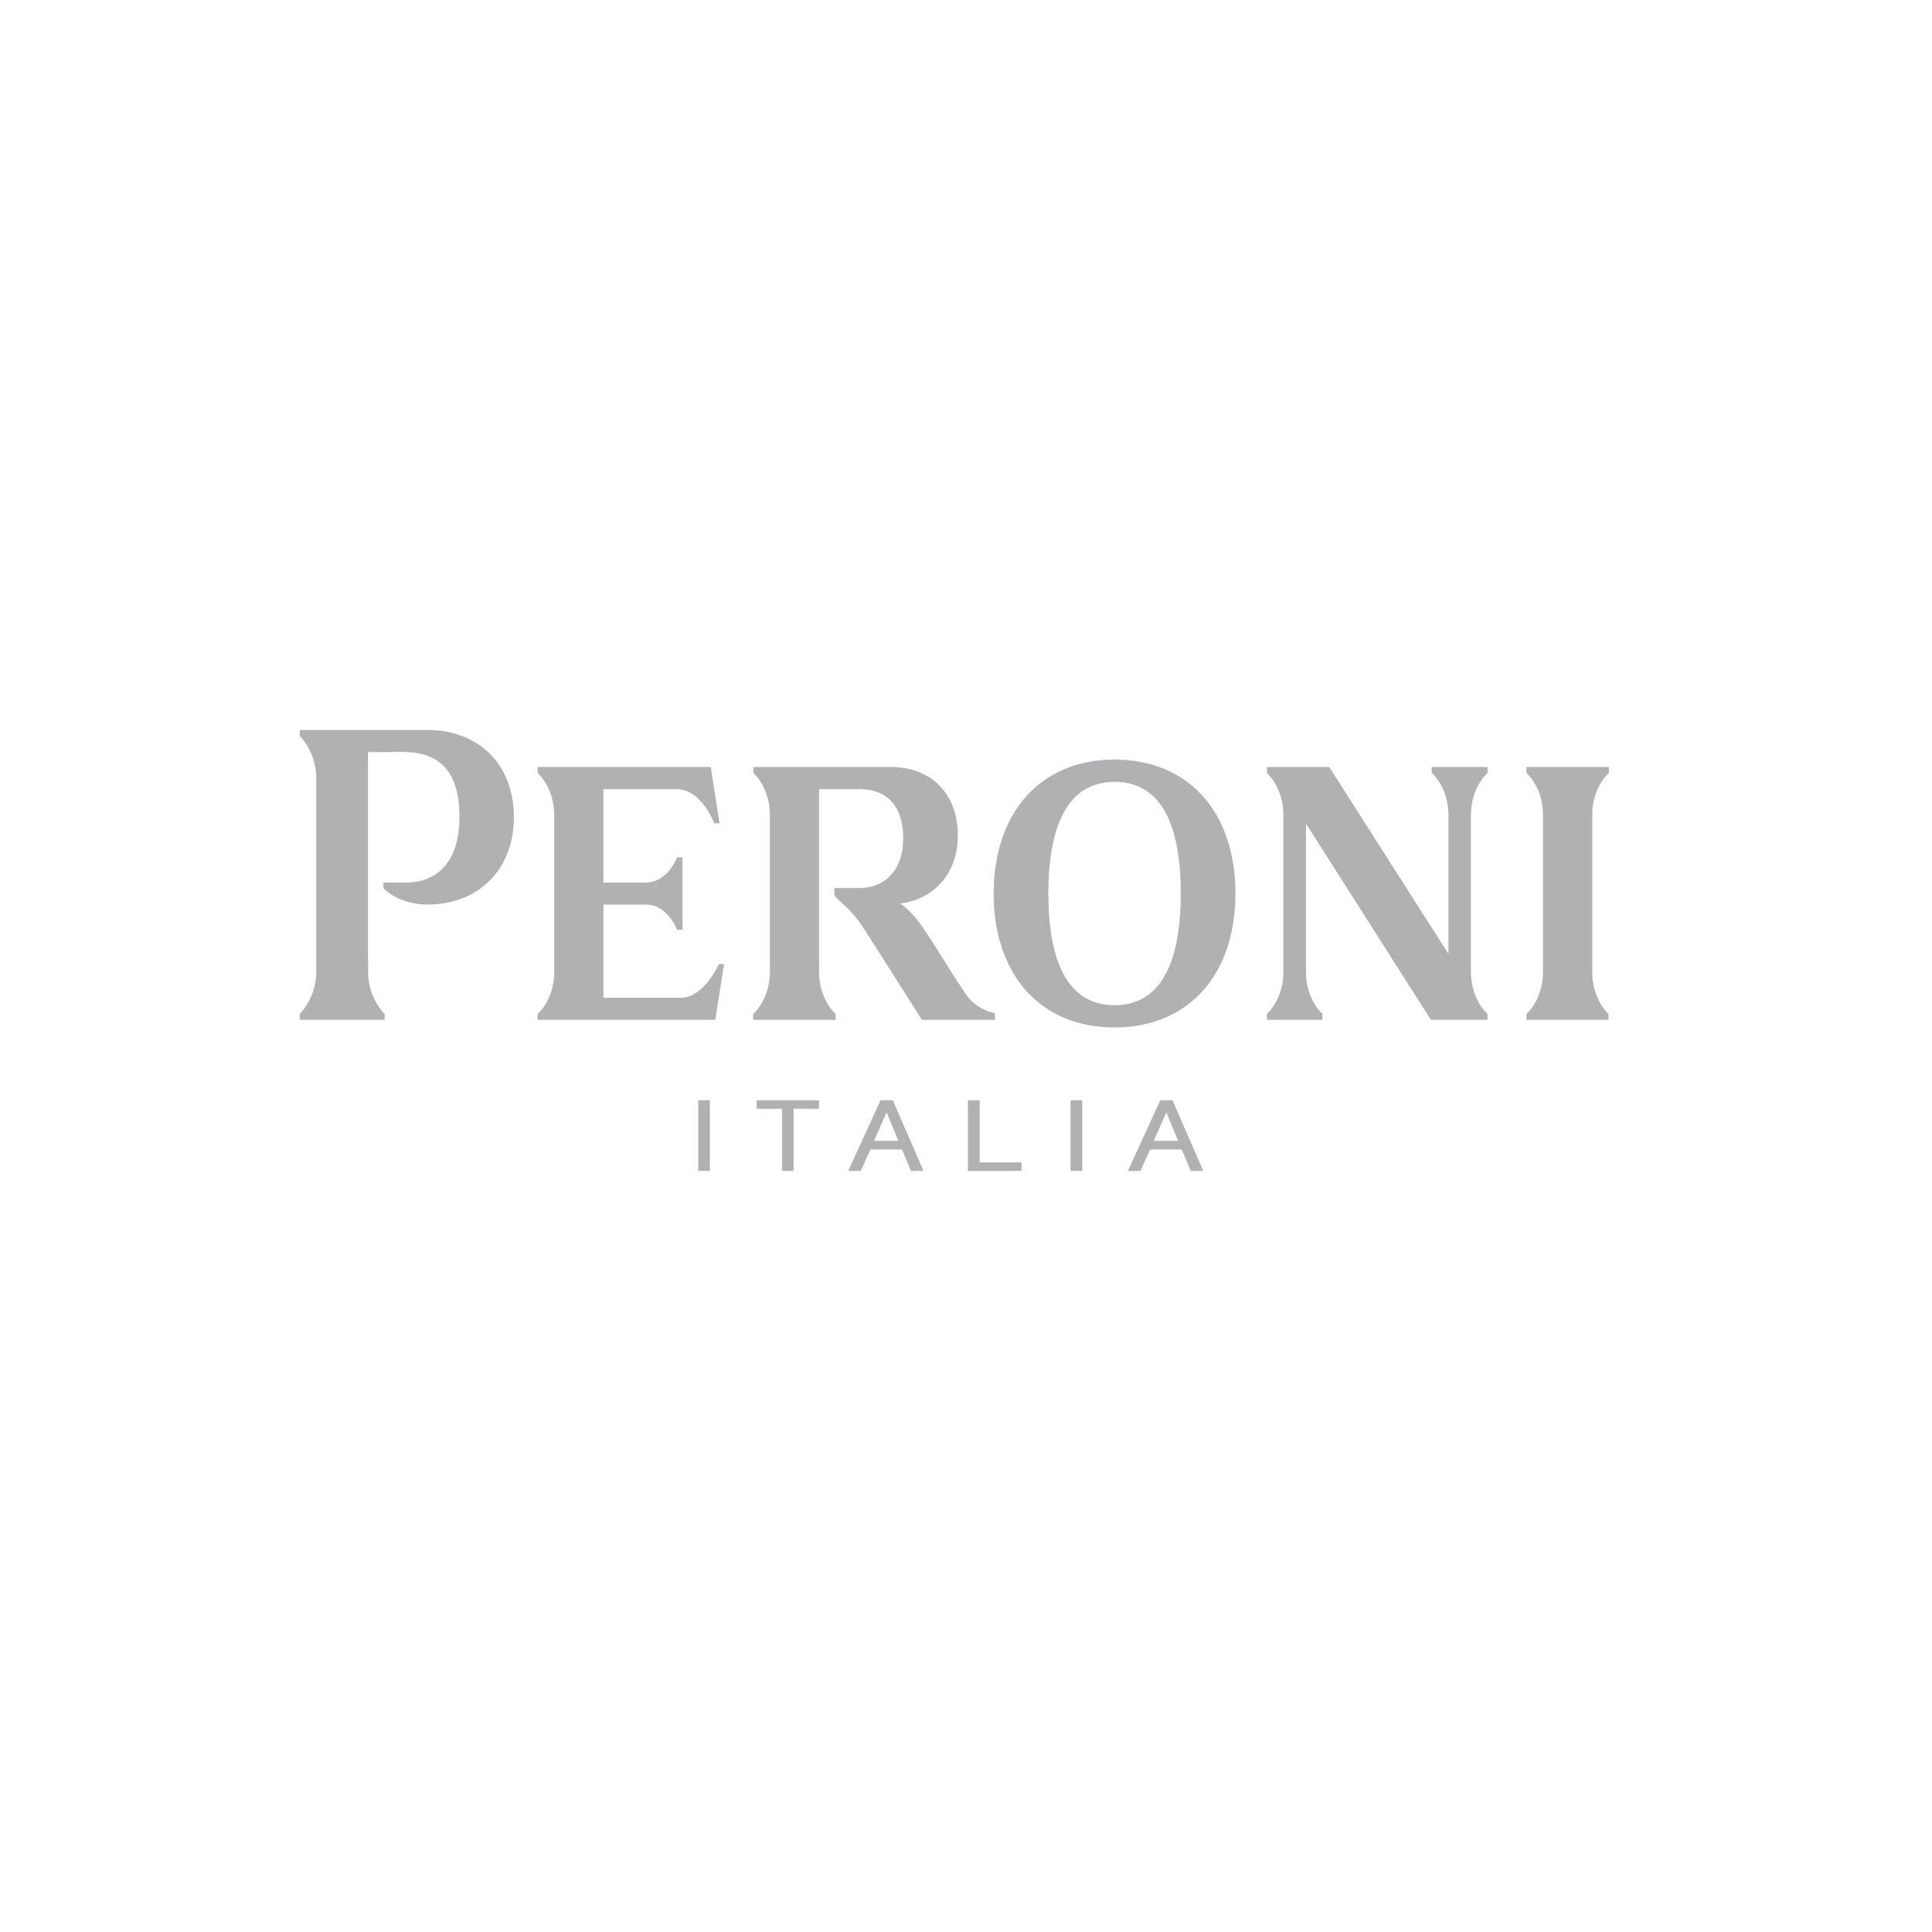 Peroni_mnemonic_master (1) copy.jpg